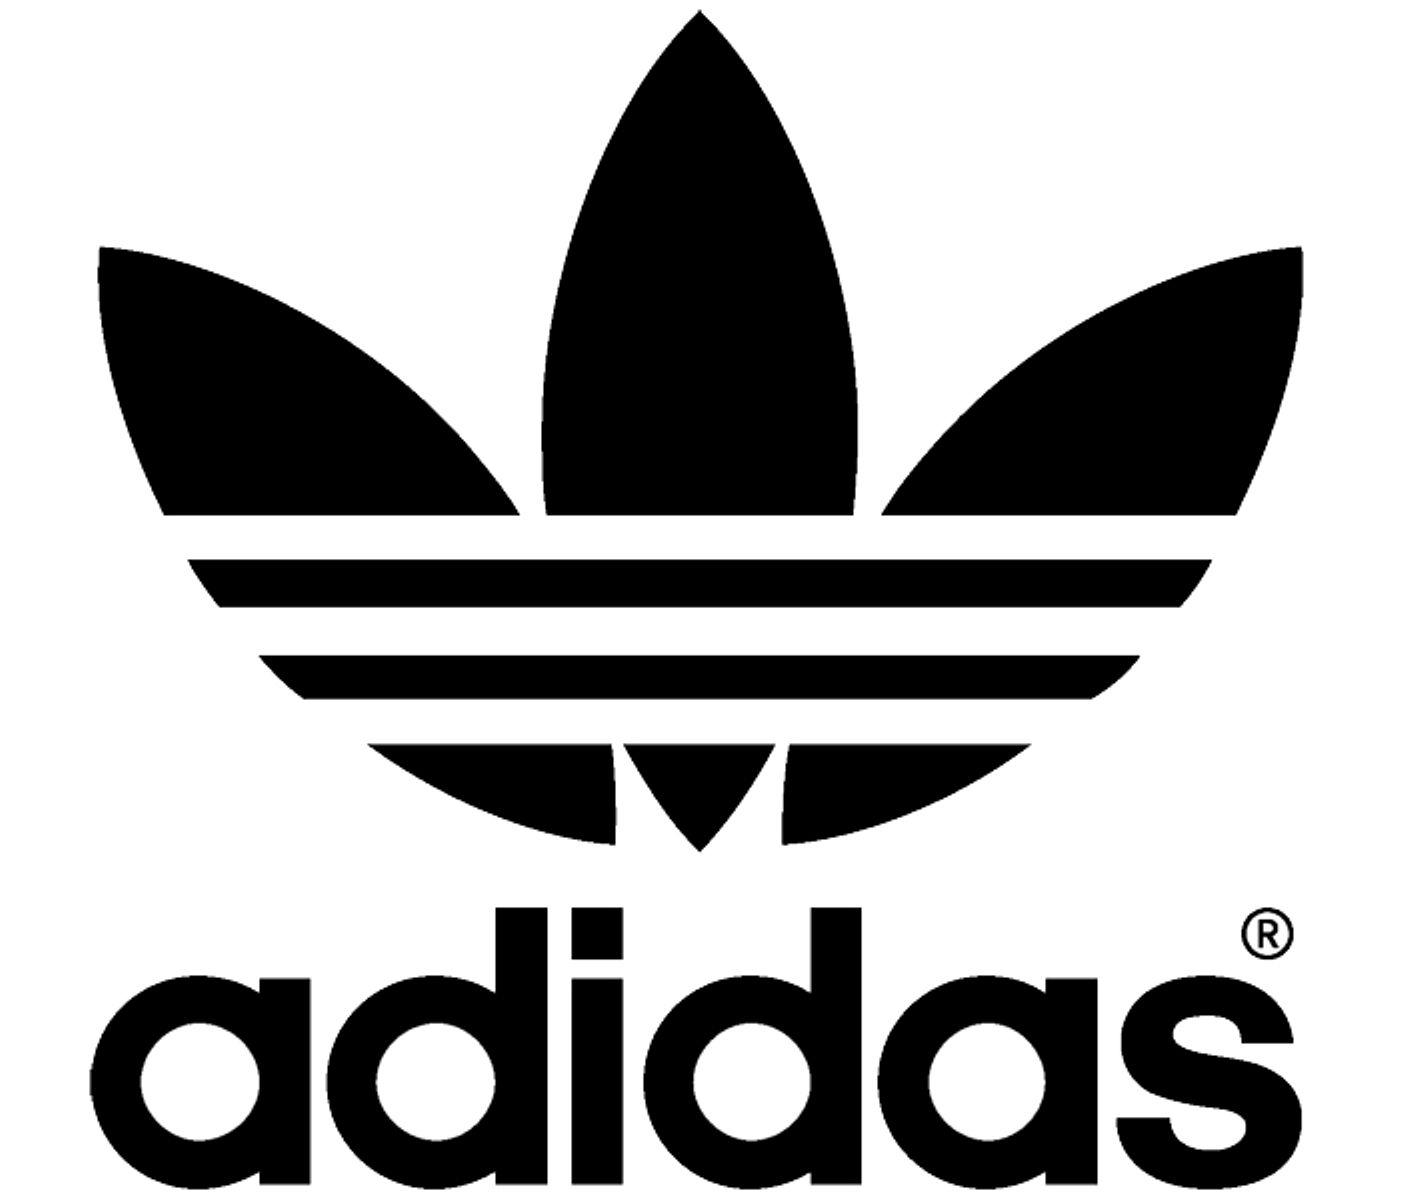 adidas-logo-for-downloads-116567.jpg (1414×1200)